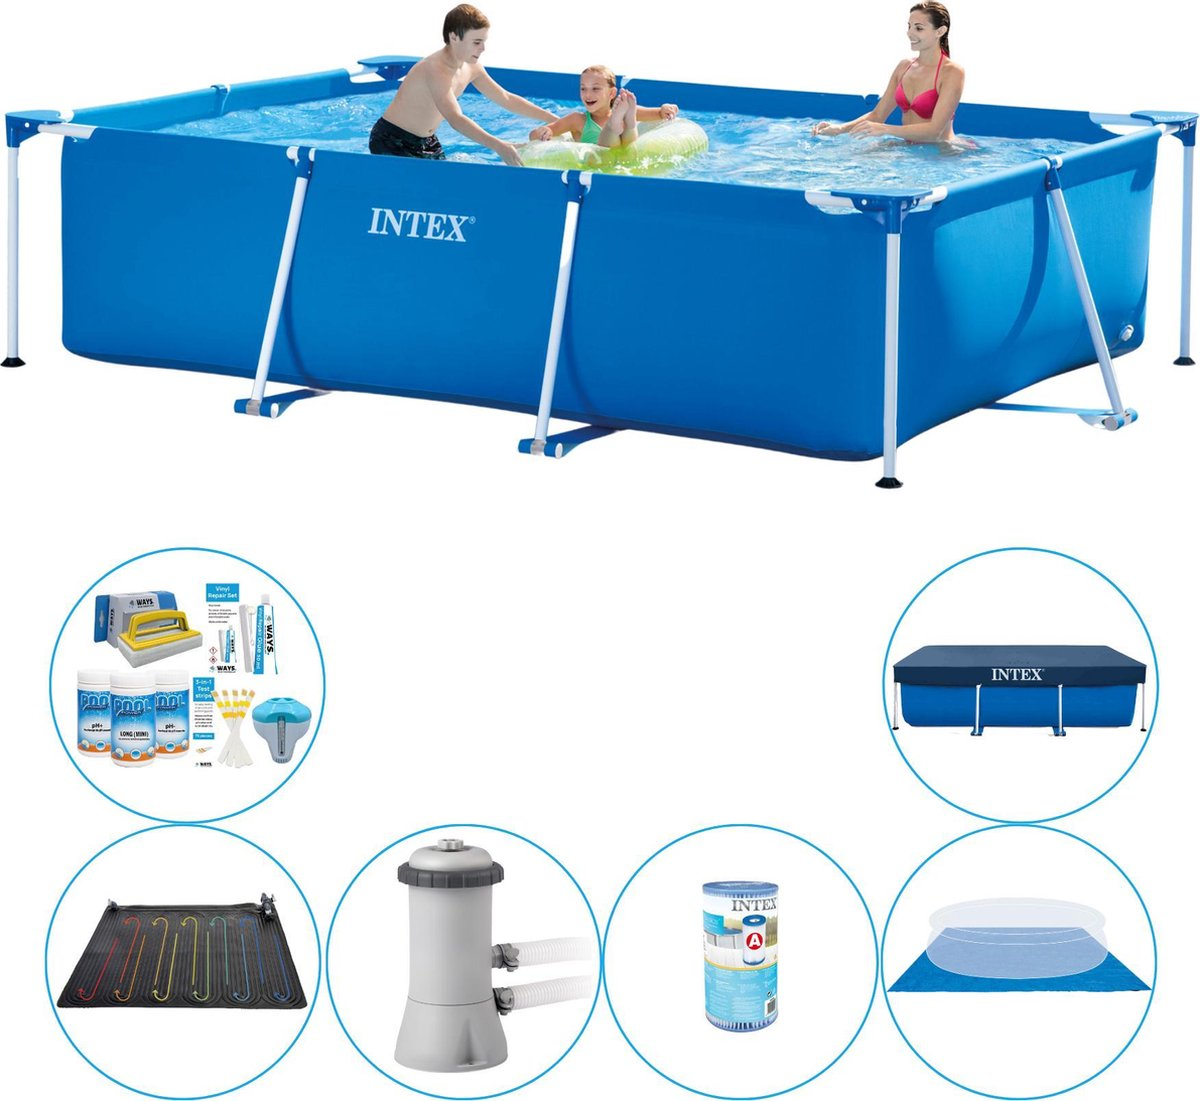 Intex Frame Pool Zwembad Deluxe Deal - 300 x 200 x 75 cm